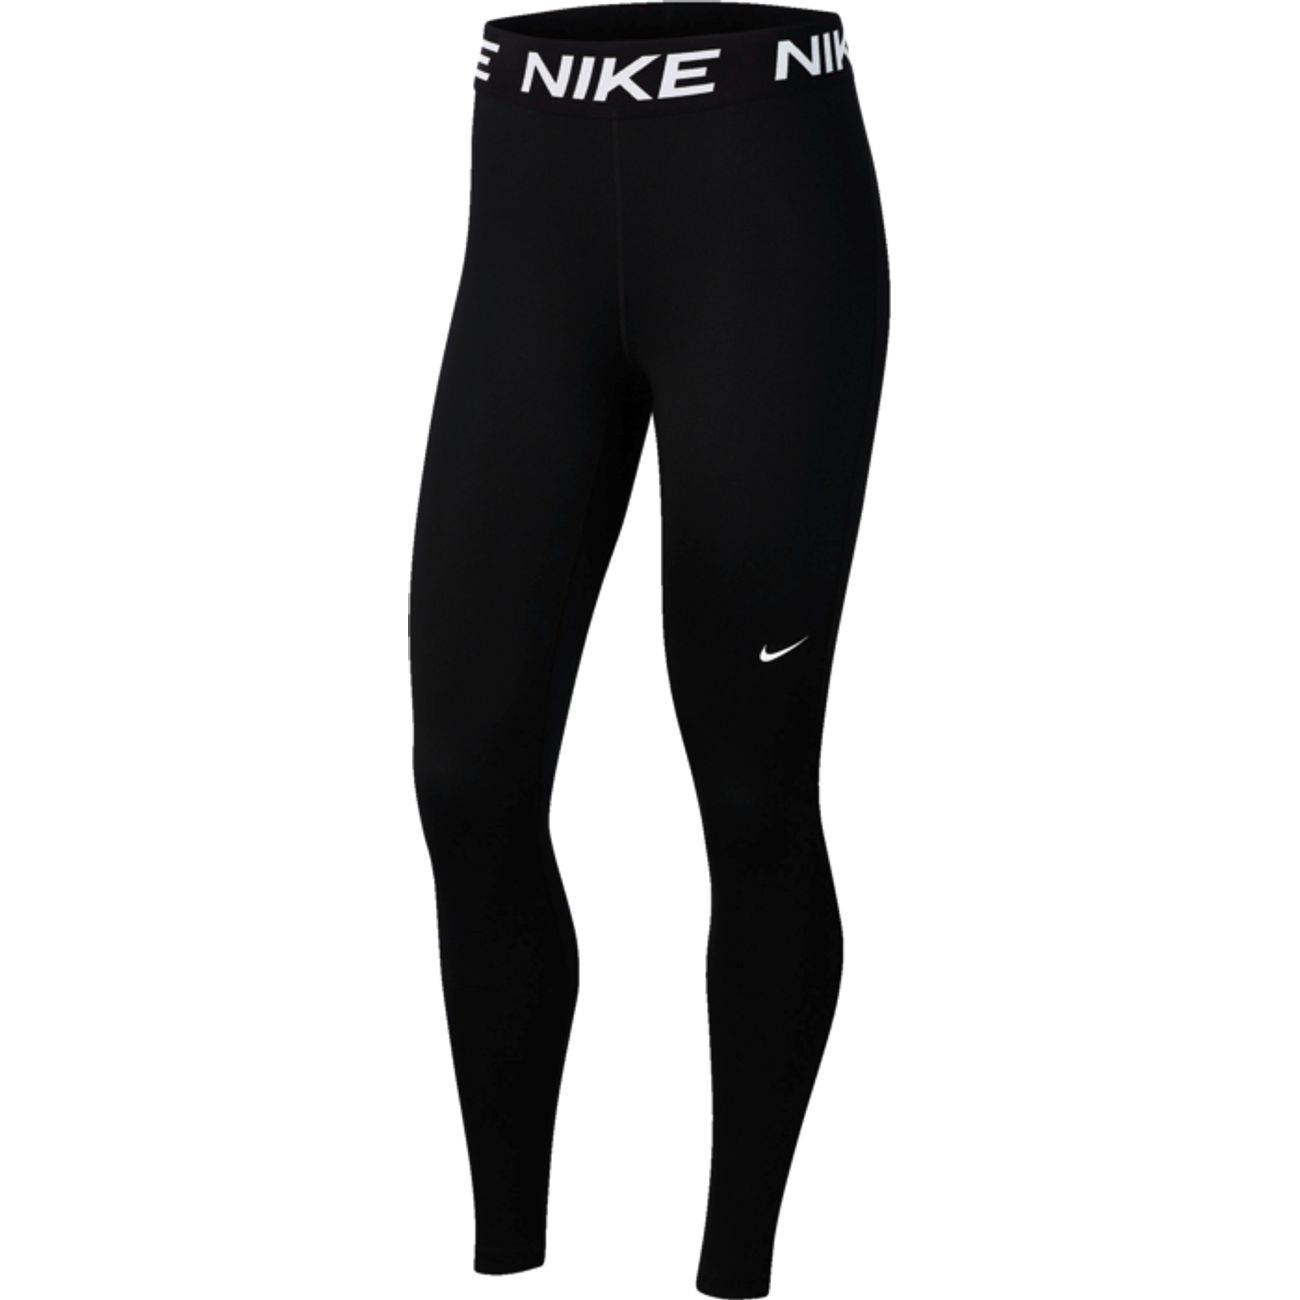 LEGGING Training femme NIKE Nike Victory